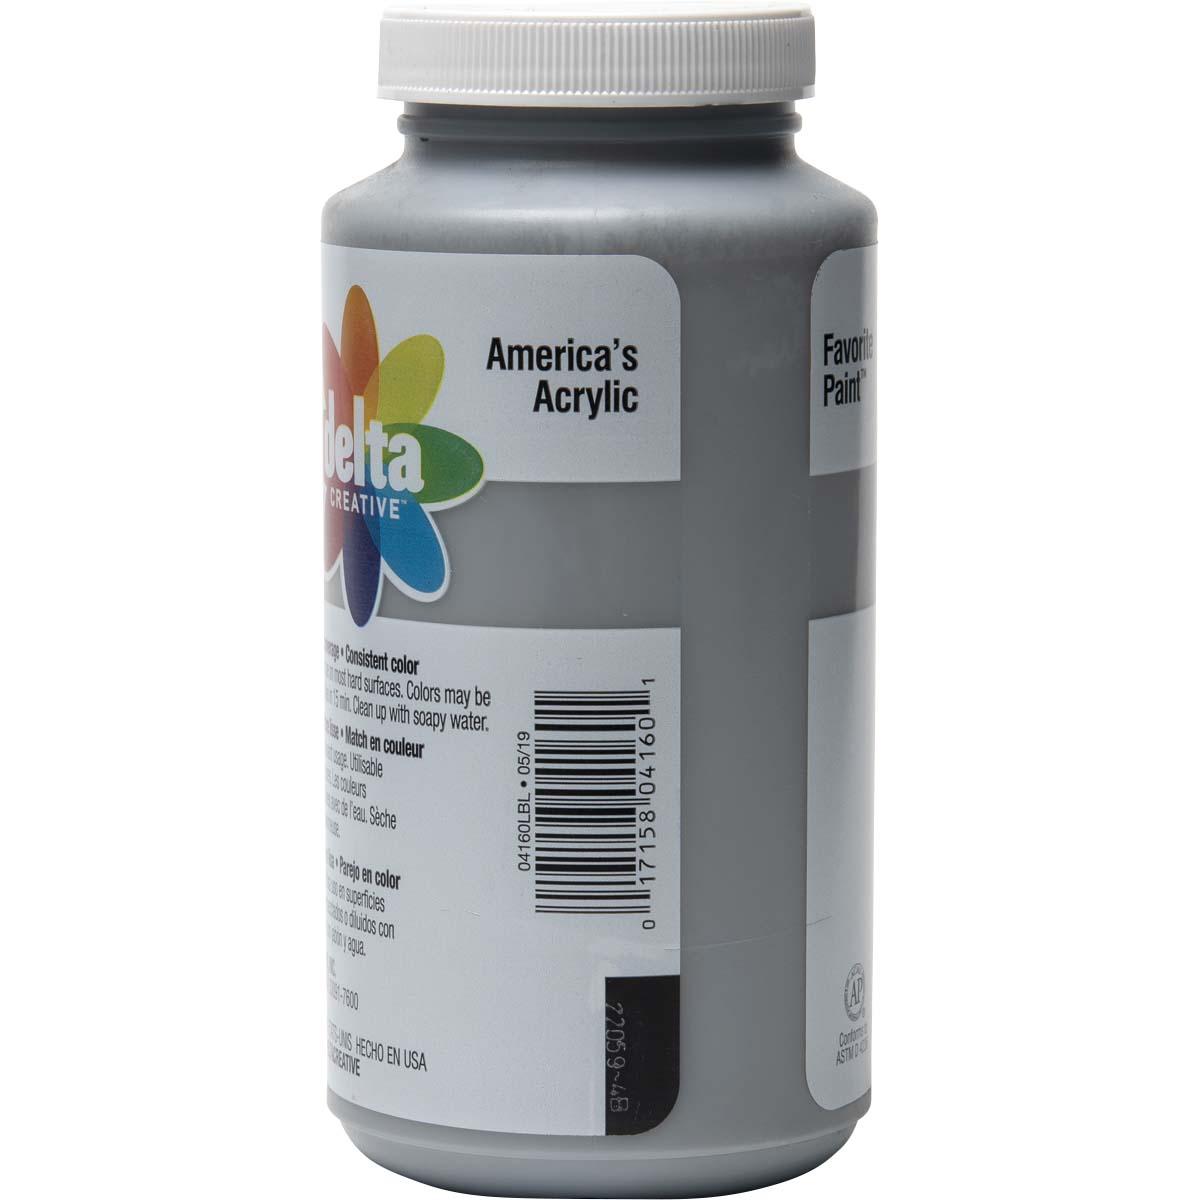 Delta Ceramcoat ® Acrylic Paint - Rain Grey, 16 oz.